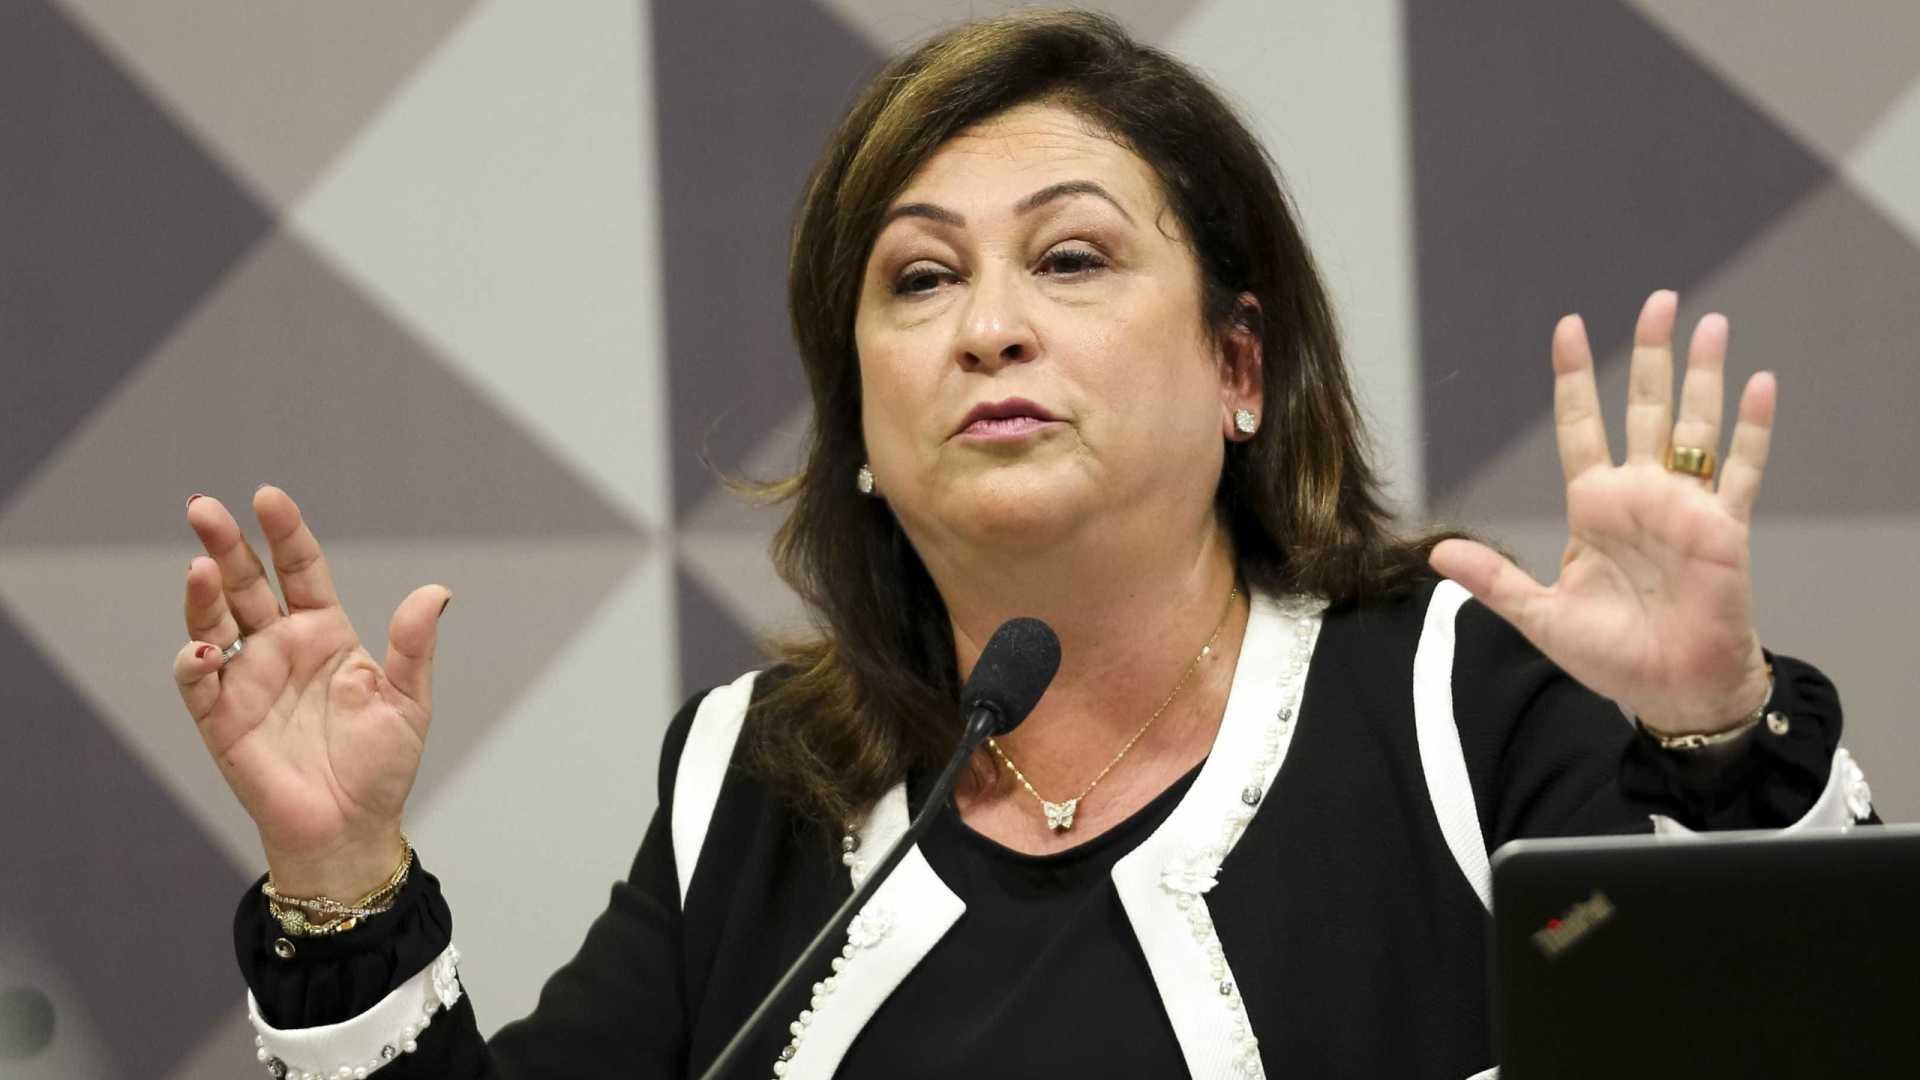 PMDB expulsa senadora por falar mal de Temer, mas mantém políticos presidiários